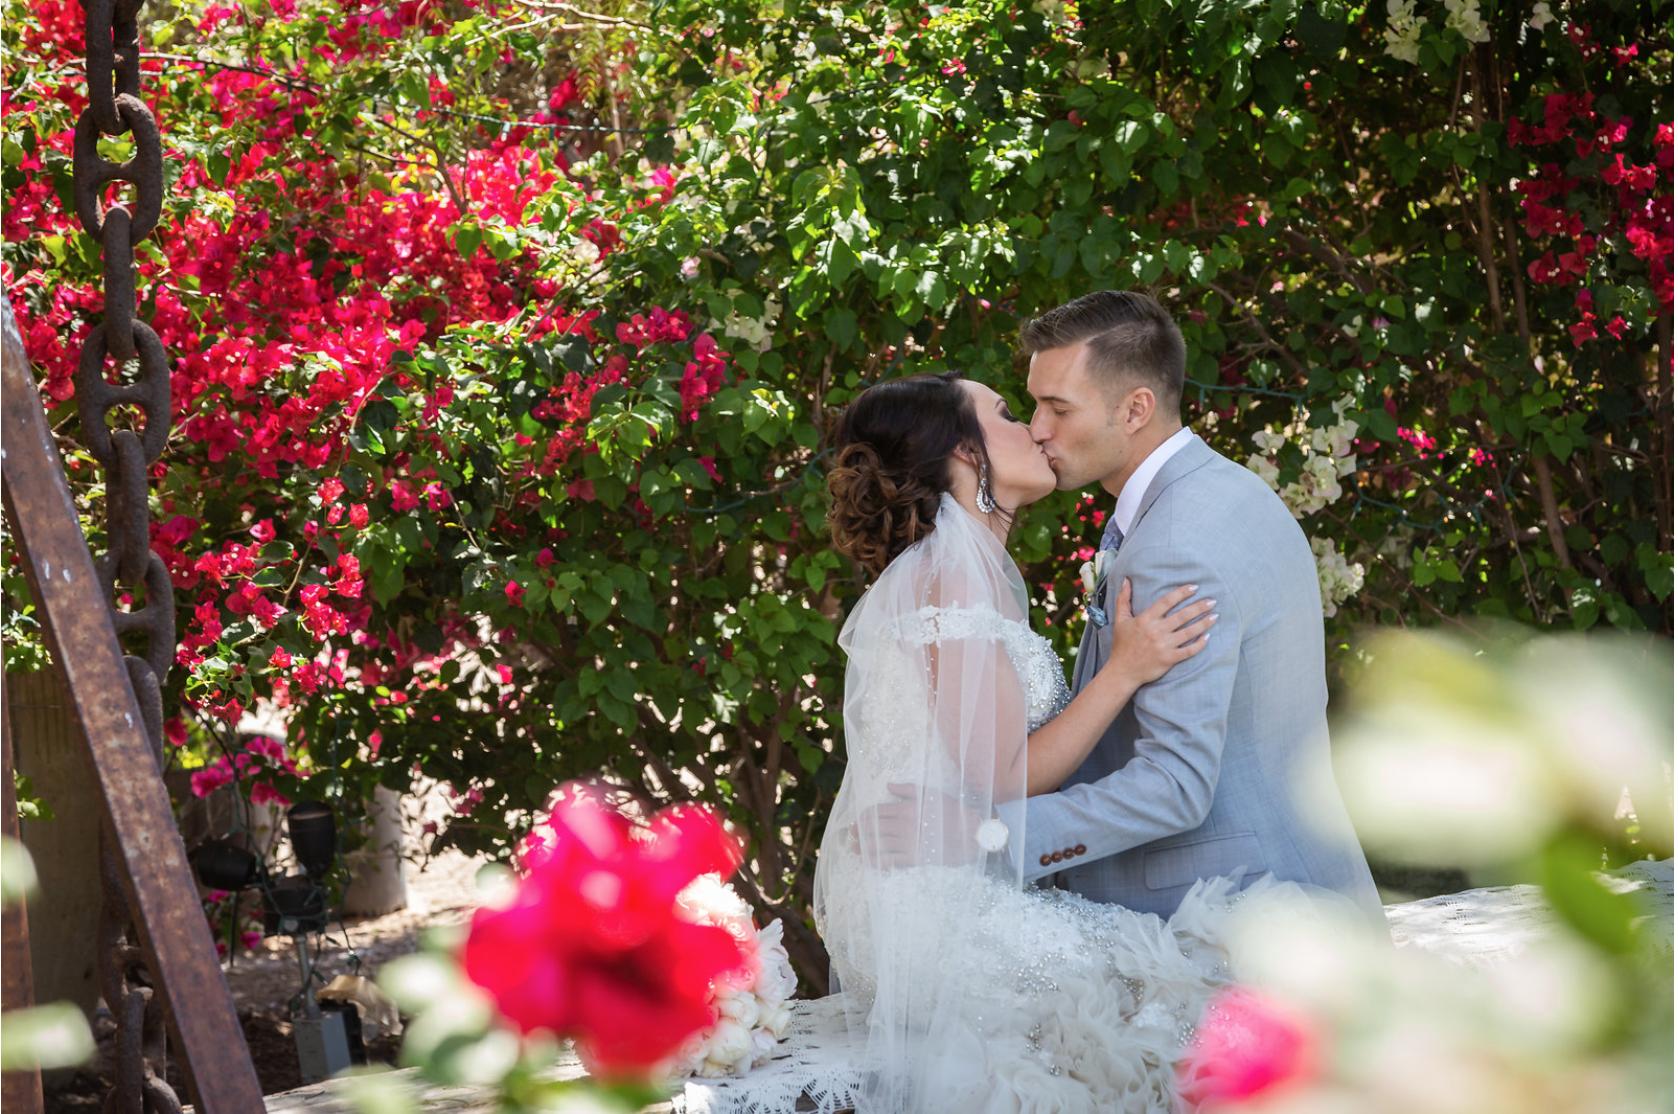 Pin by Villa de Amore California Wedd on Spring Weddings